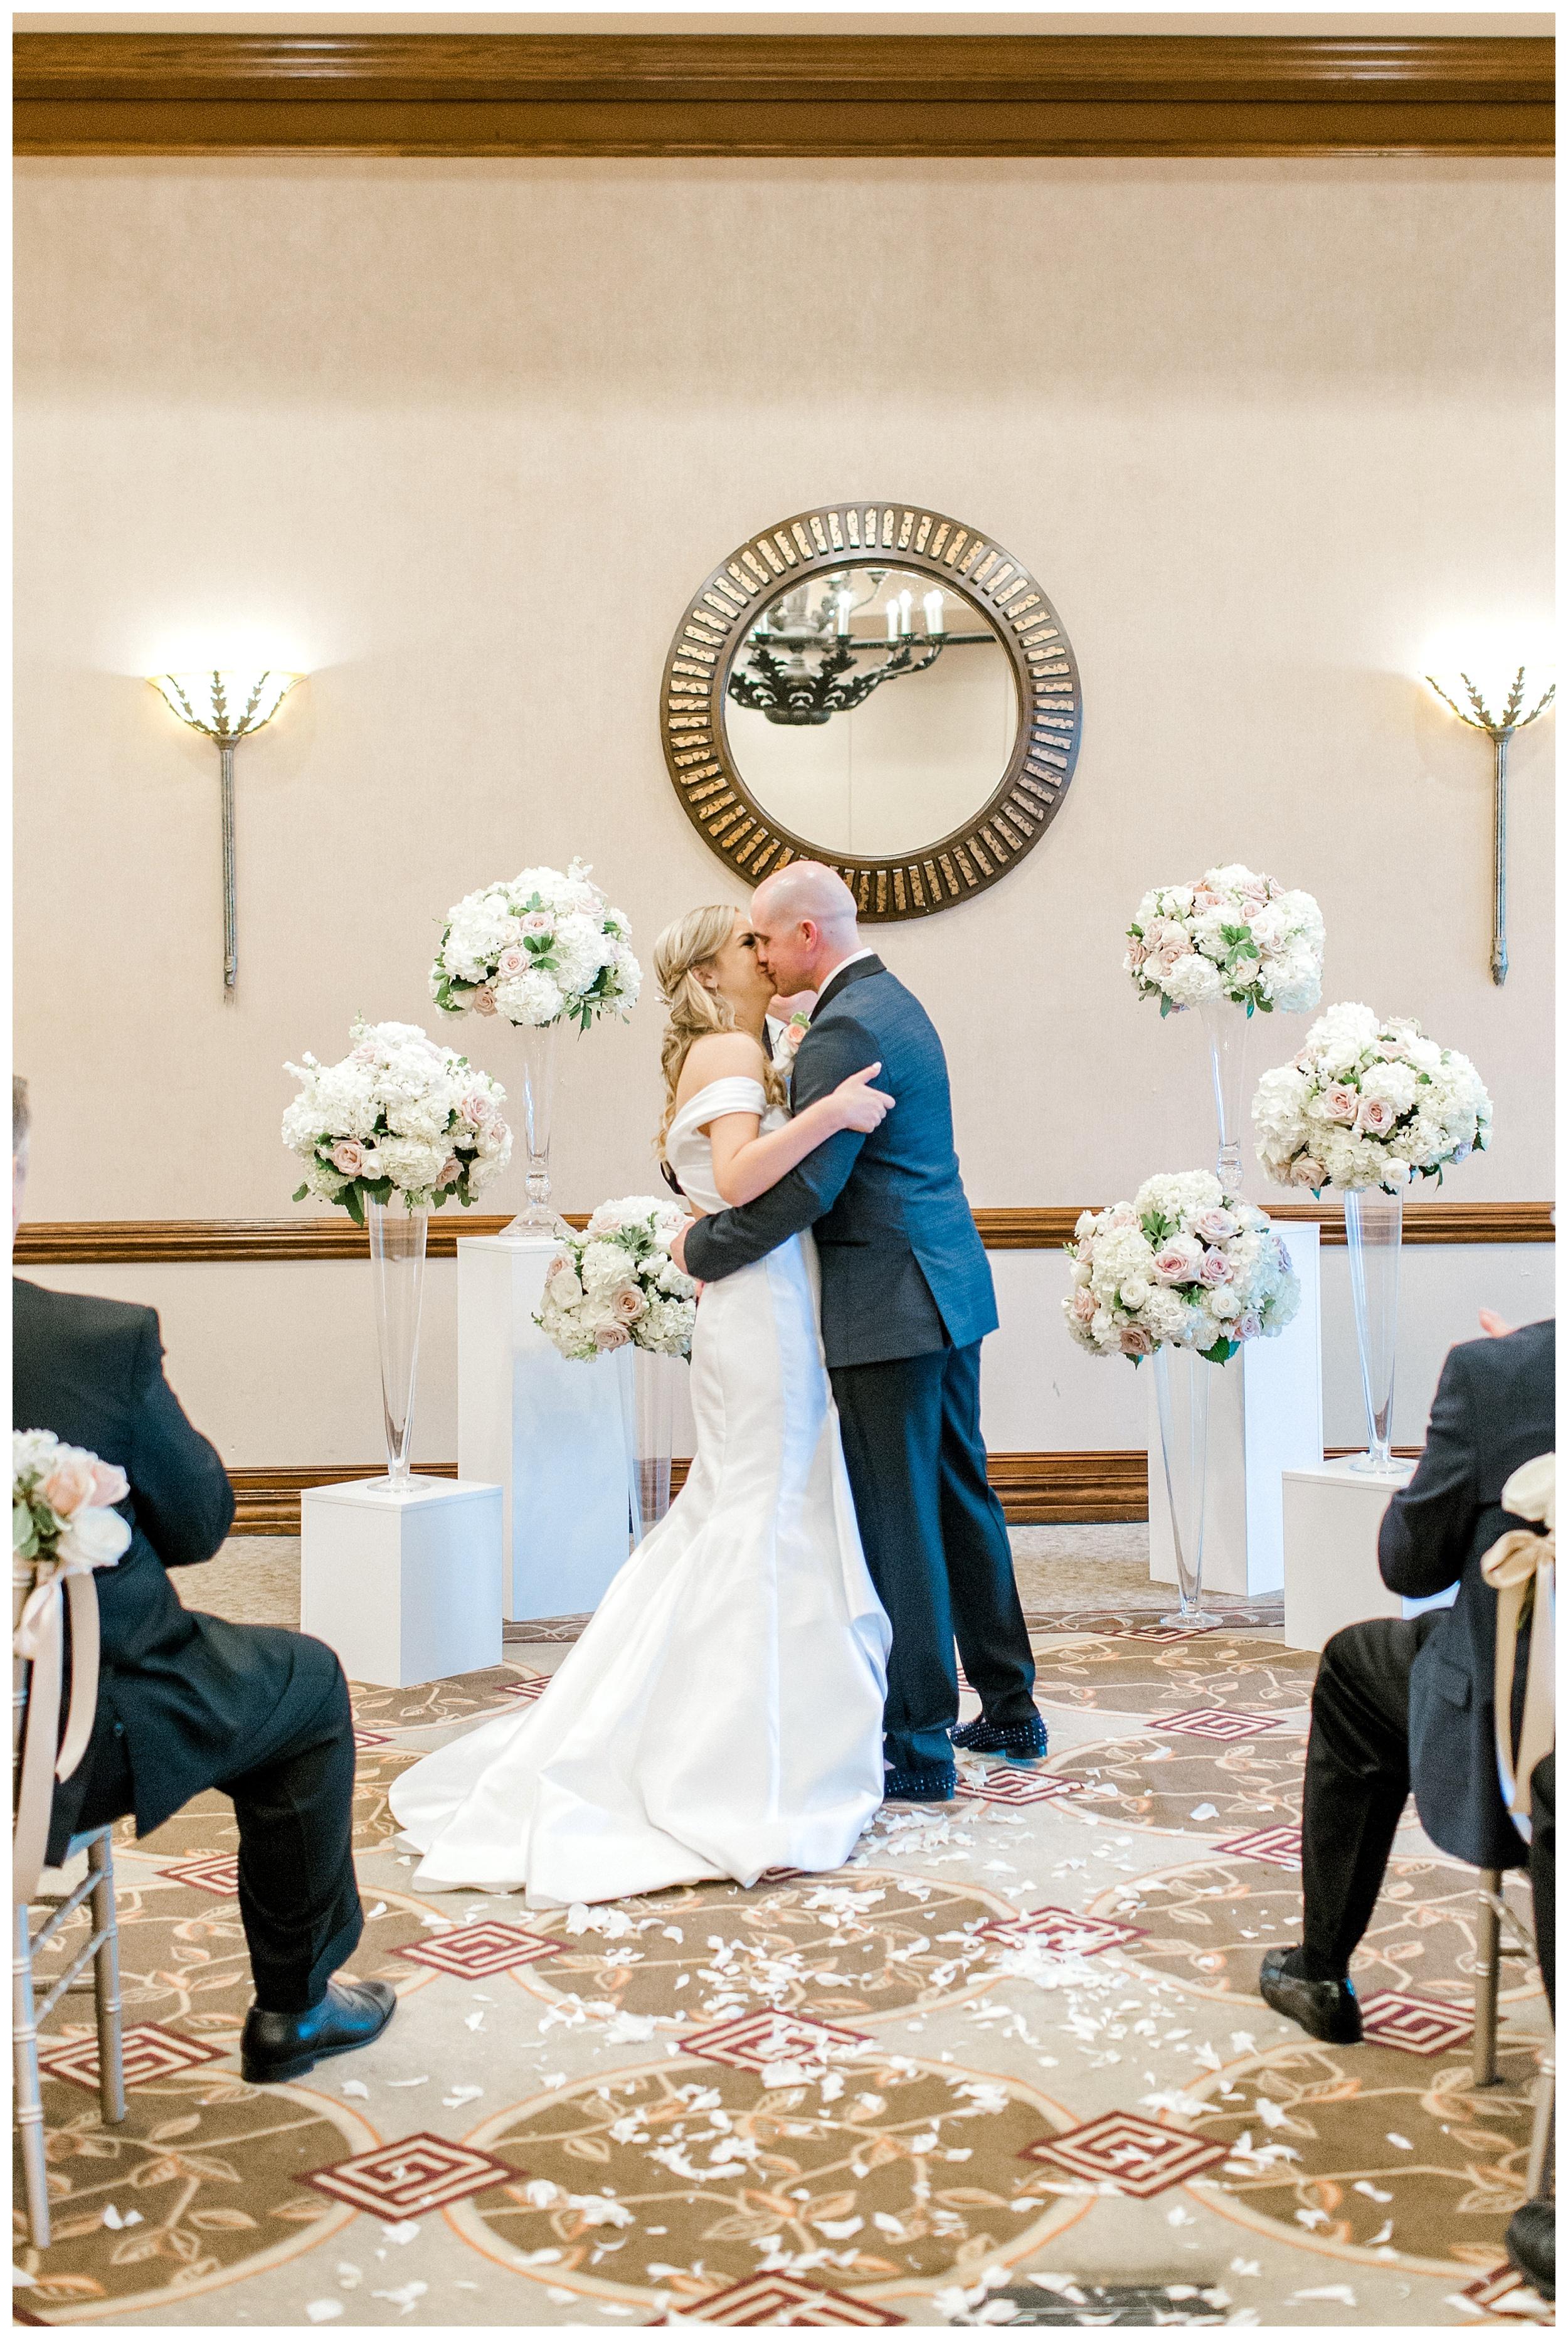 Lansdowne Resort Wedding | Virginia Film Wedding Photographer Kir Tuben_0057.jpg